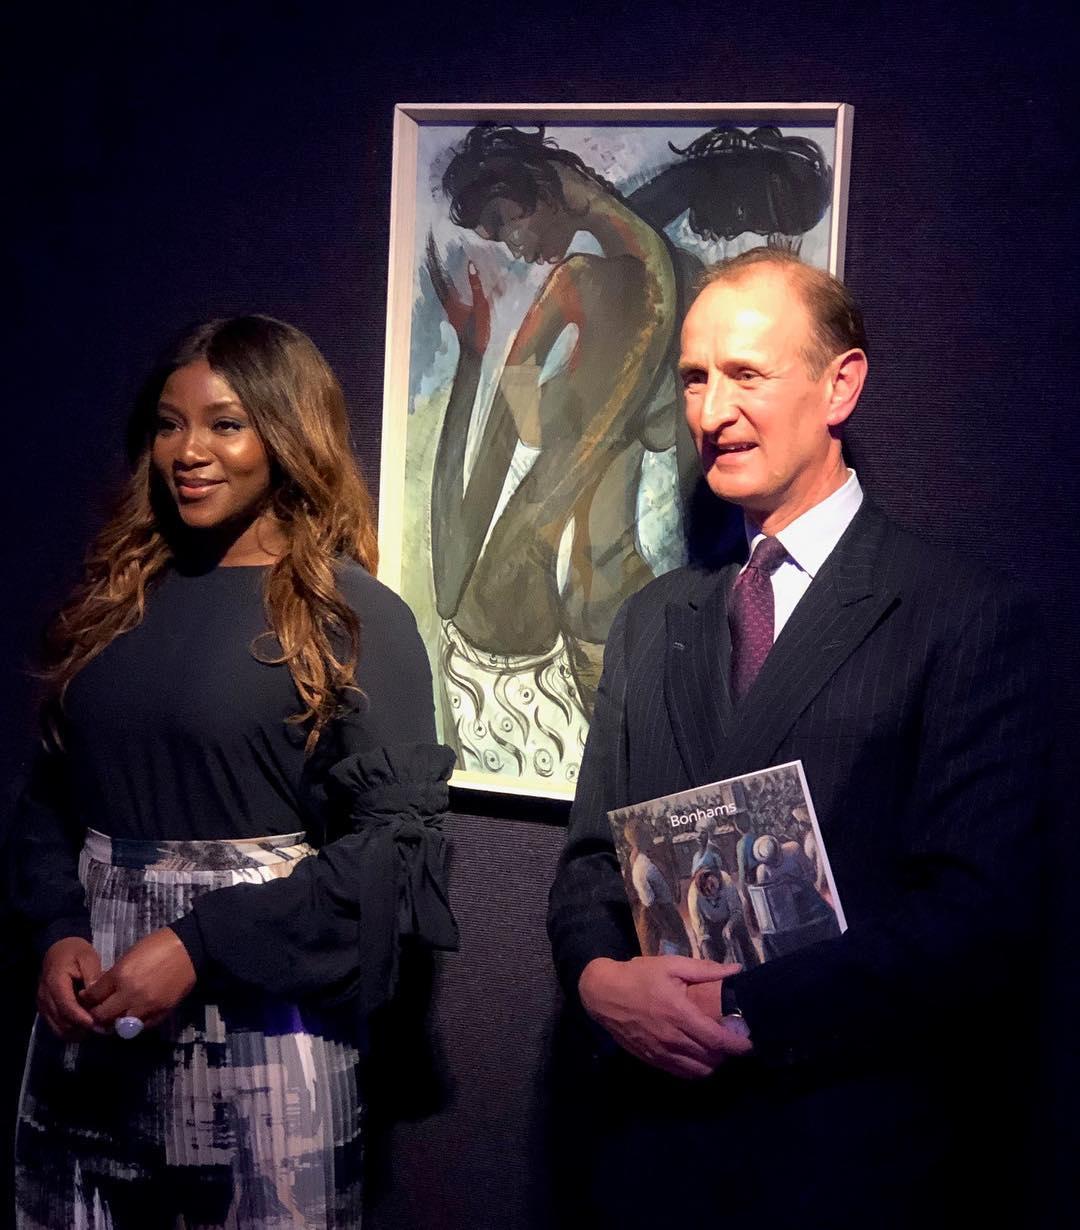 Genevieve Nnaji was a guest at Bonhams African Art headquarters in London where she screened her directorial debut, 'Lionheart' in 2019. [Instagaram/Bonhams]